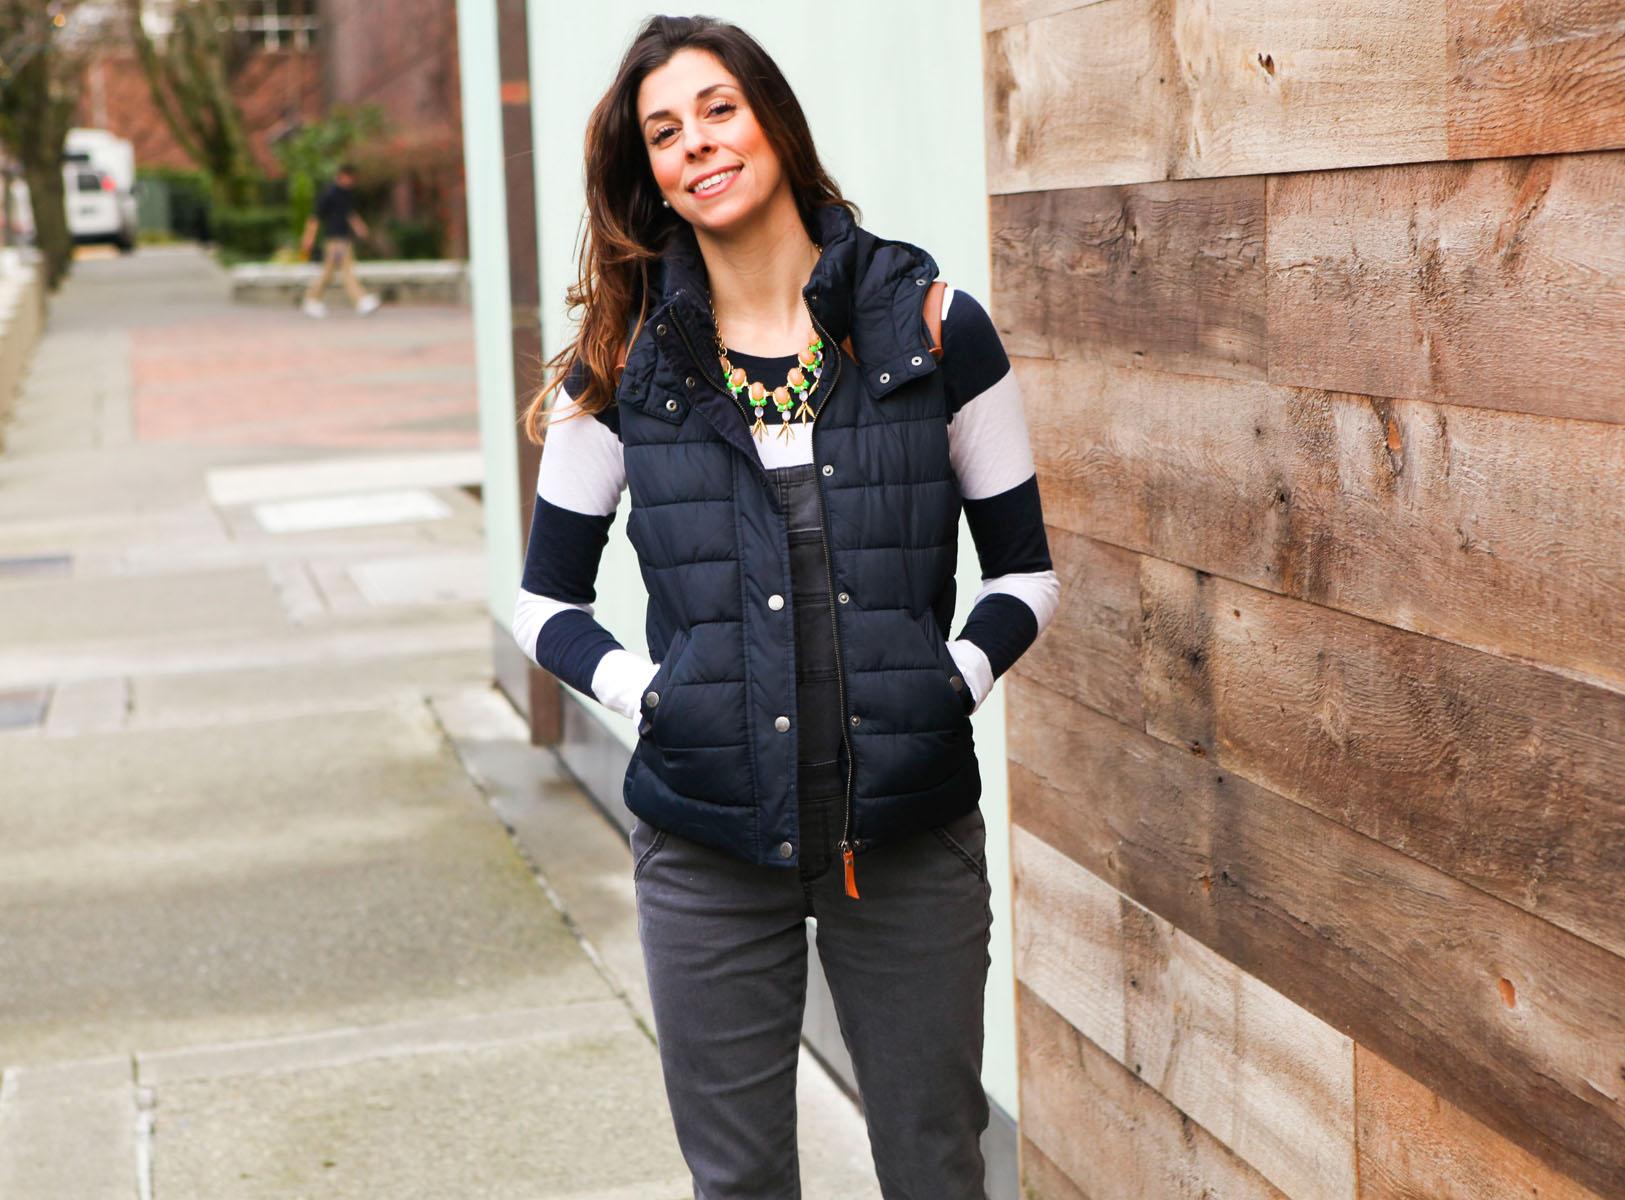 Abercrombie Overalls and vest